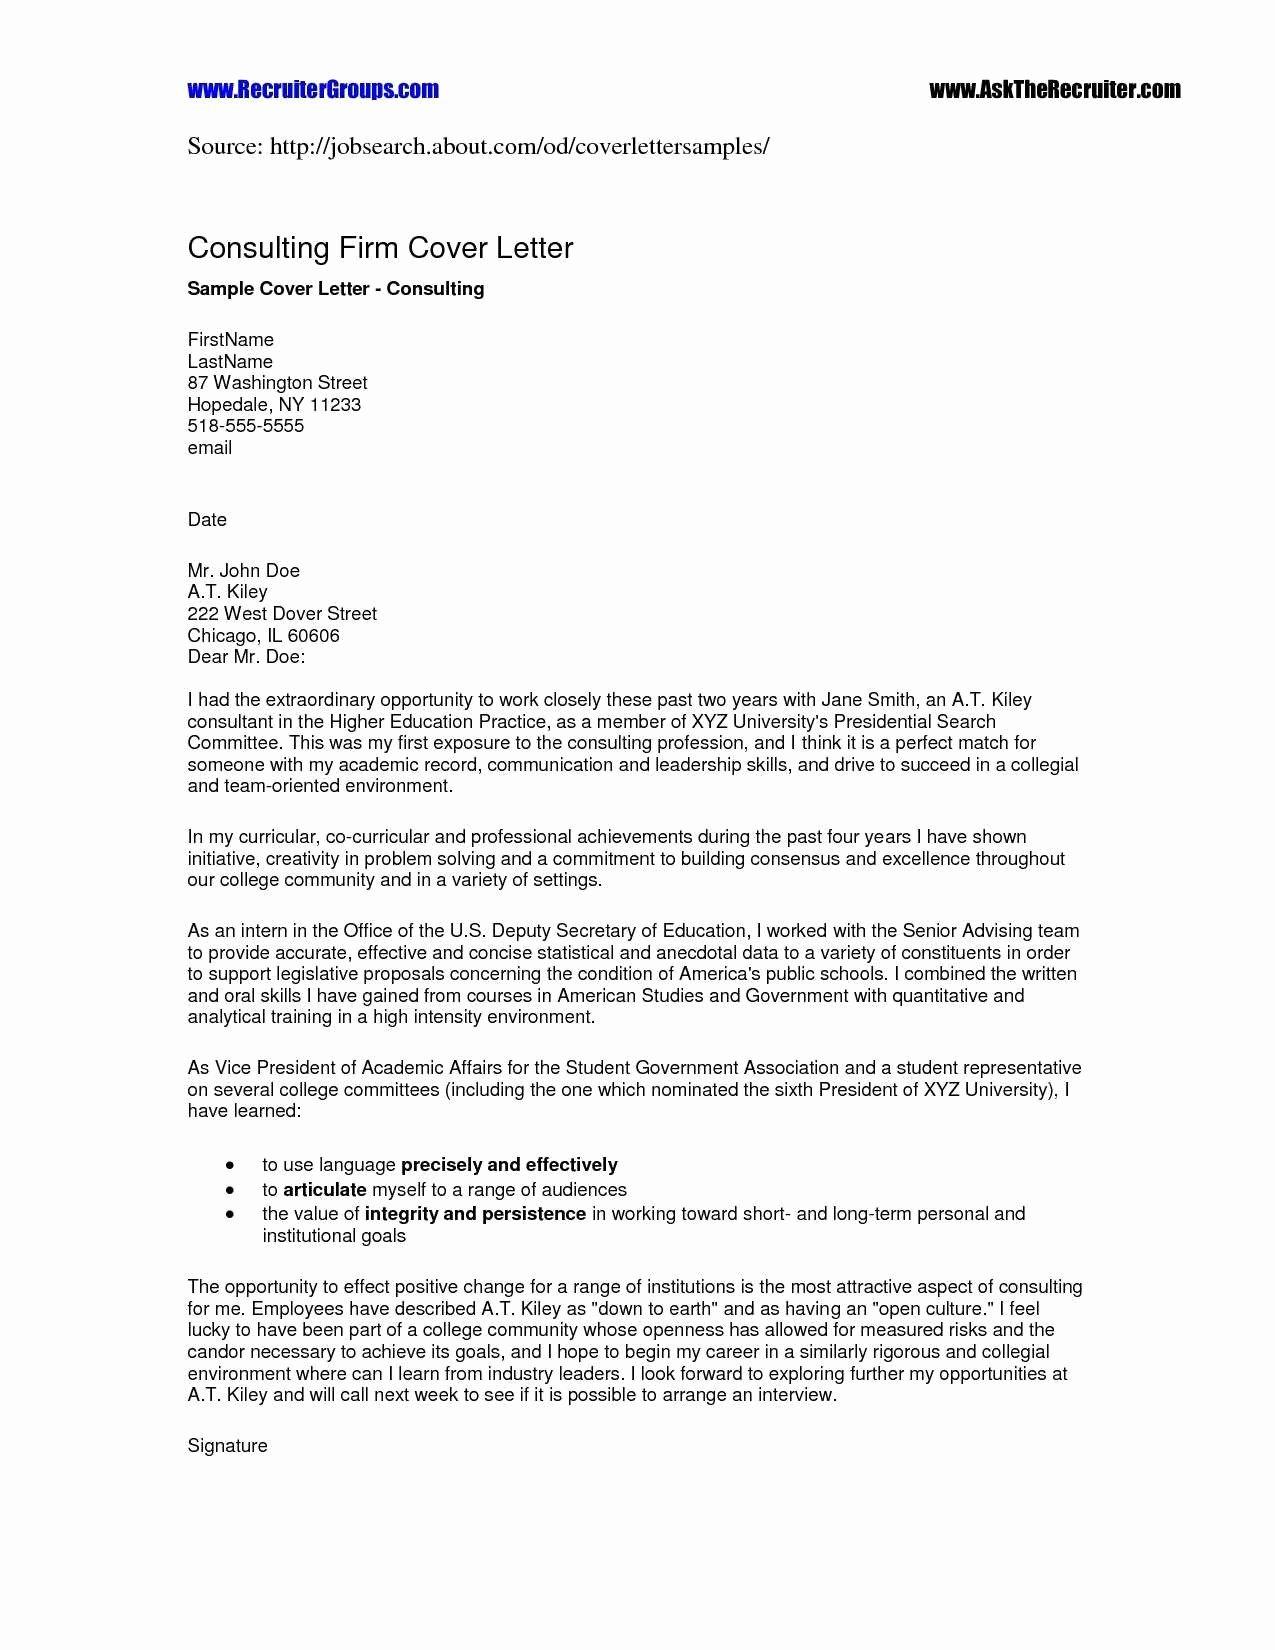 Business Collaboration Letter Sample Fresh Business Collaboration Letter Template Samples